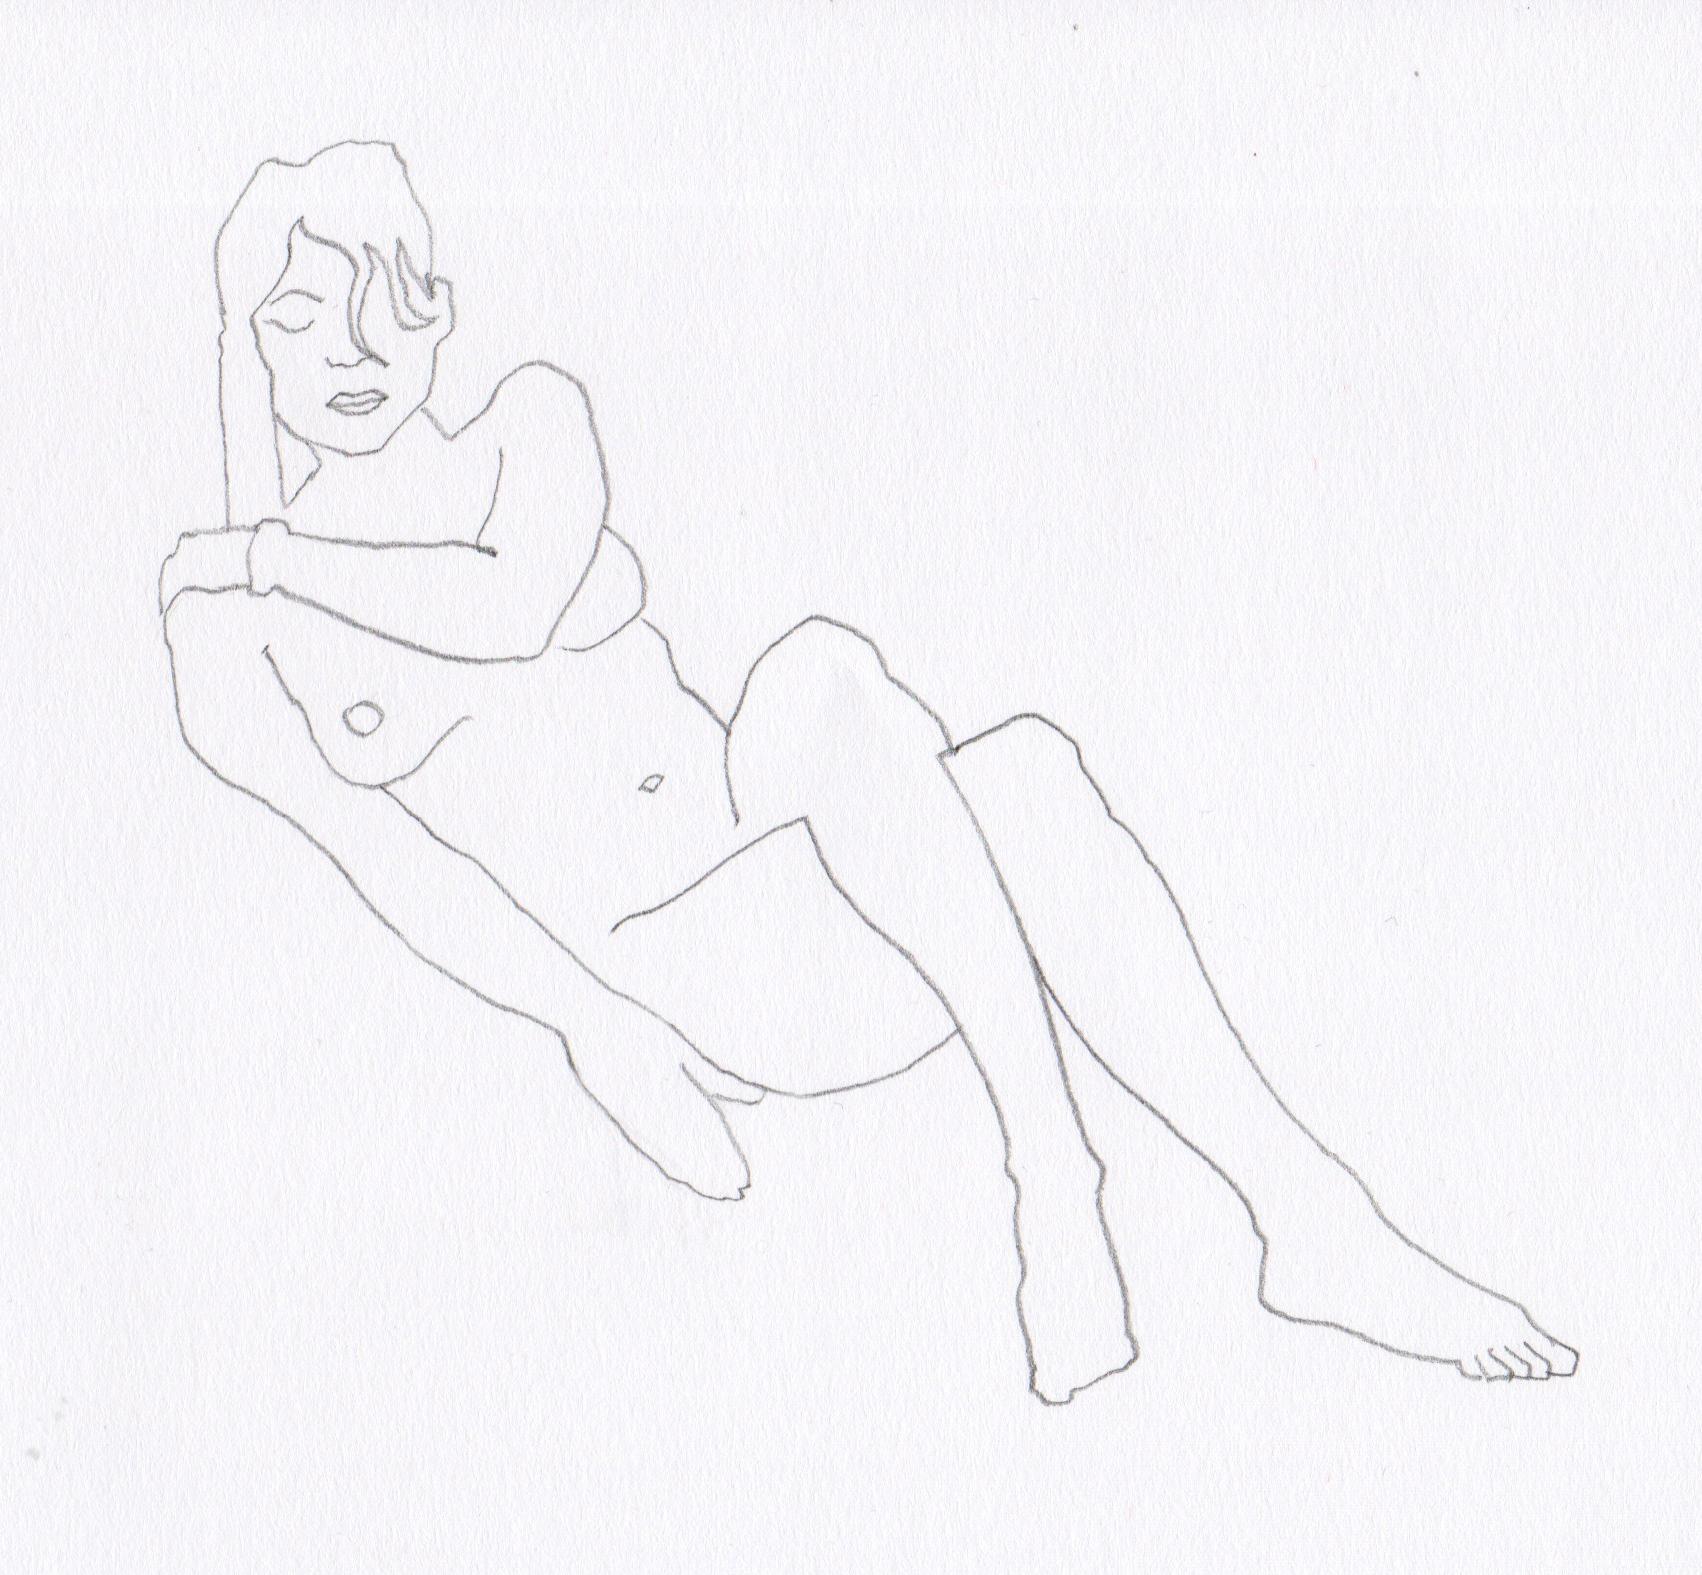 2012_Sketch_F-Beudin_009